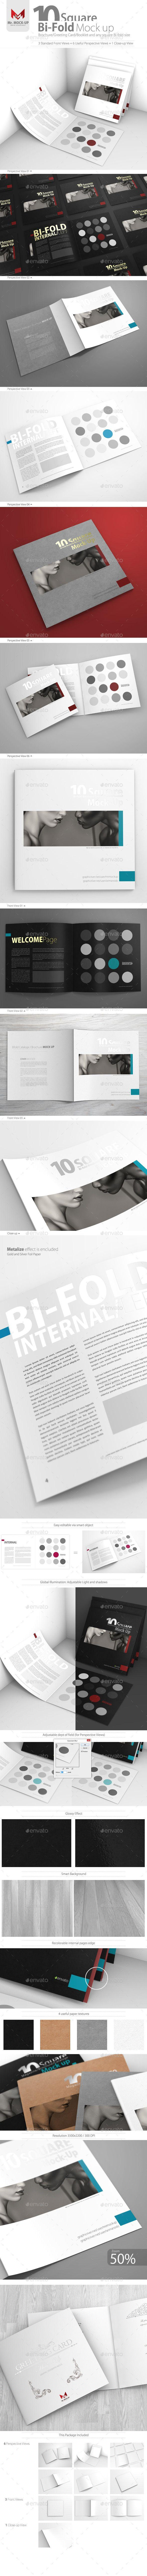 Square Bi-Fold Brochure Mock-Up #design Download: http://graphicriver.net/item/square-bifold-brochure-mockup/12369638?ref=ksioks